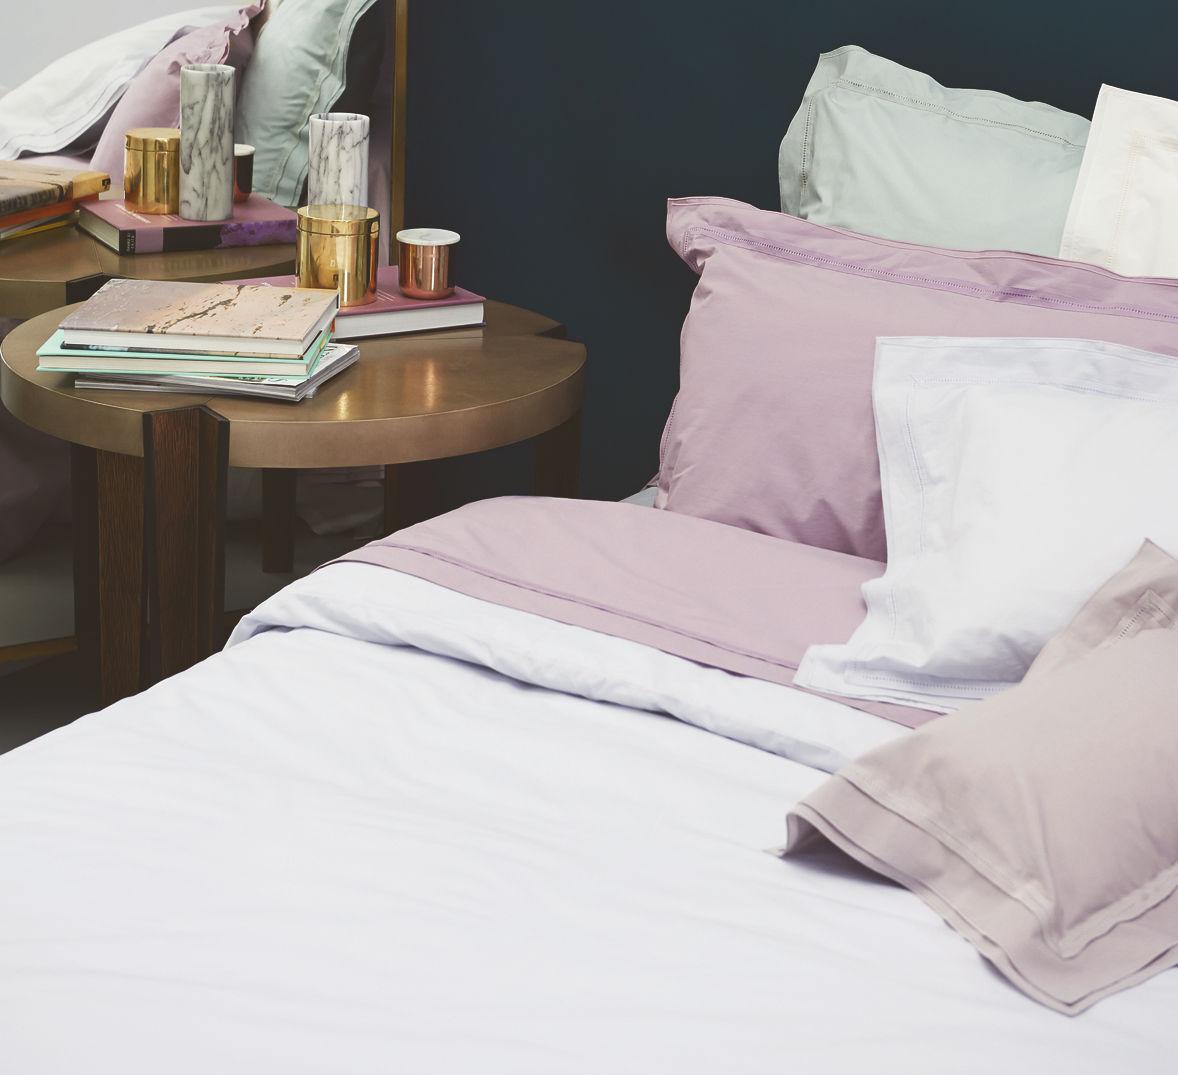 nina ricci point du jour satin spannbettlaken boudoir. Black Bedroom Furniture Sets. Home Design Ideas